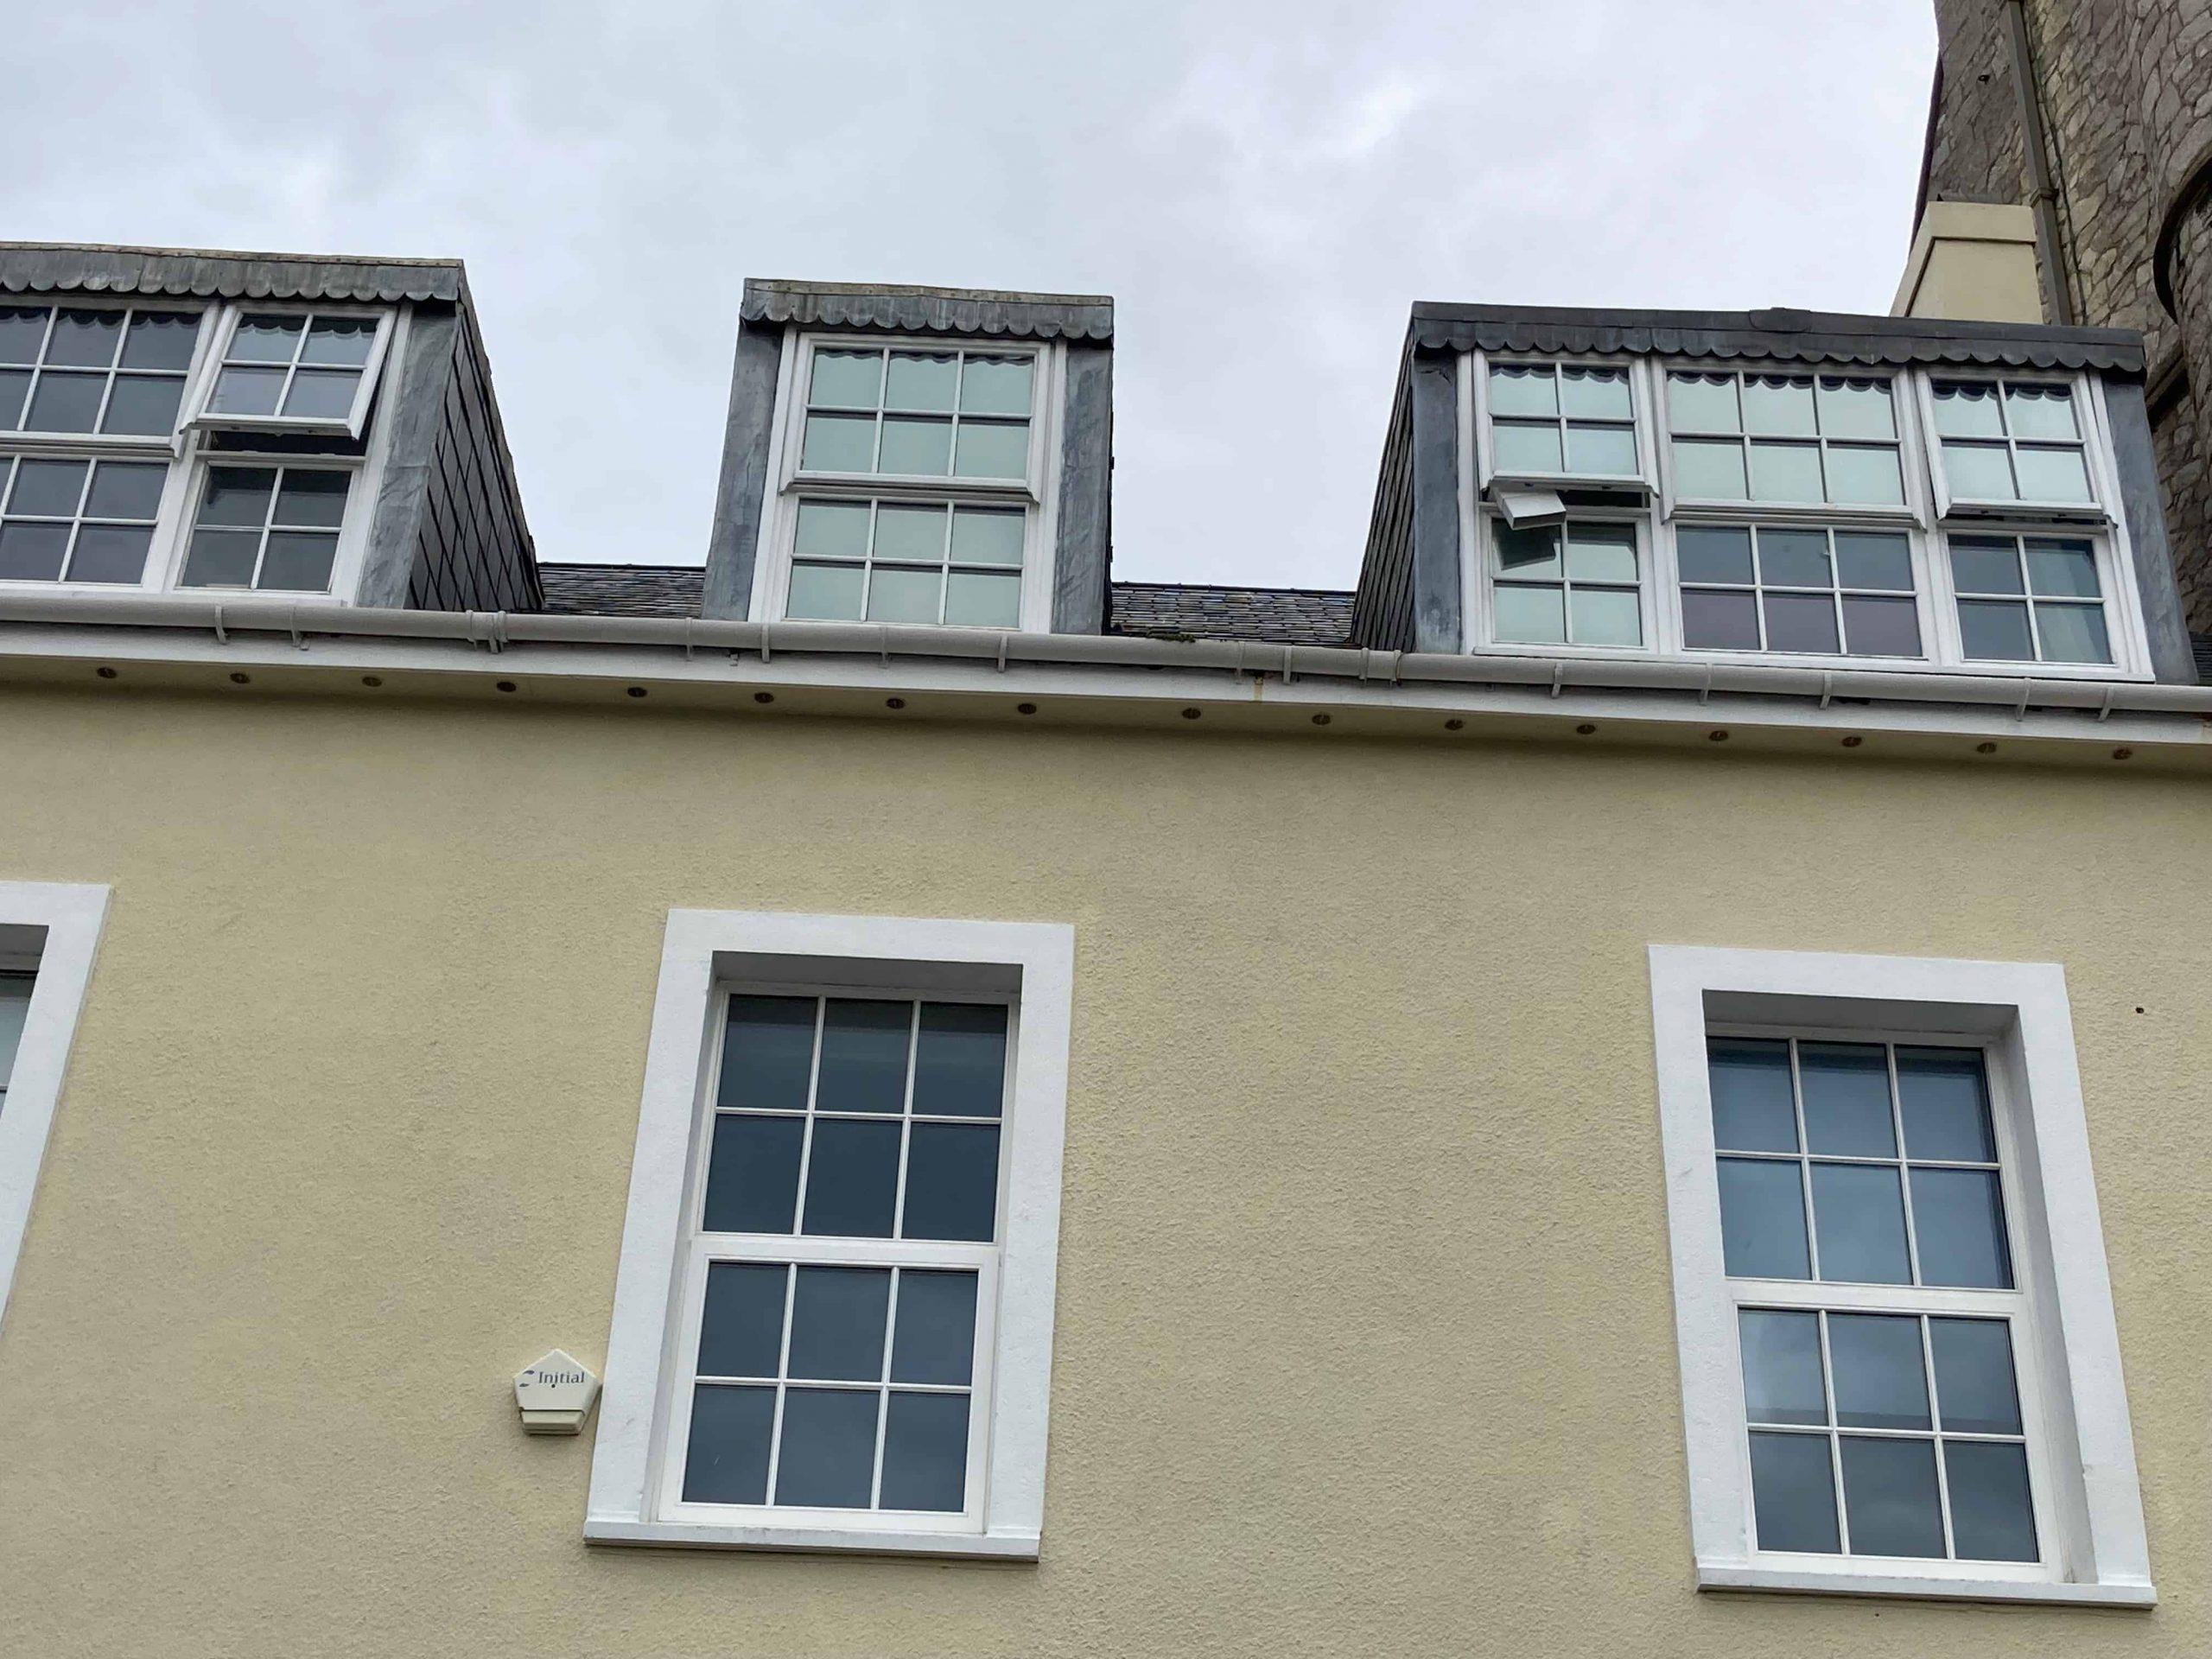 Medium Tint Solar Control Window Film in Torquay